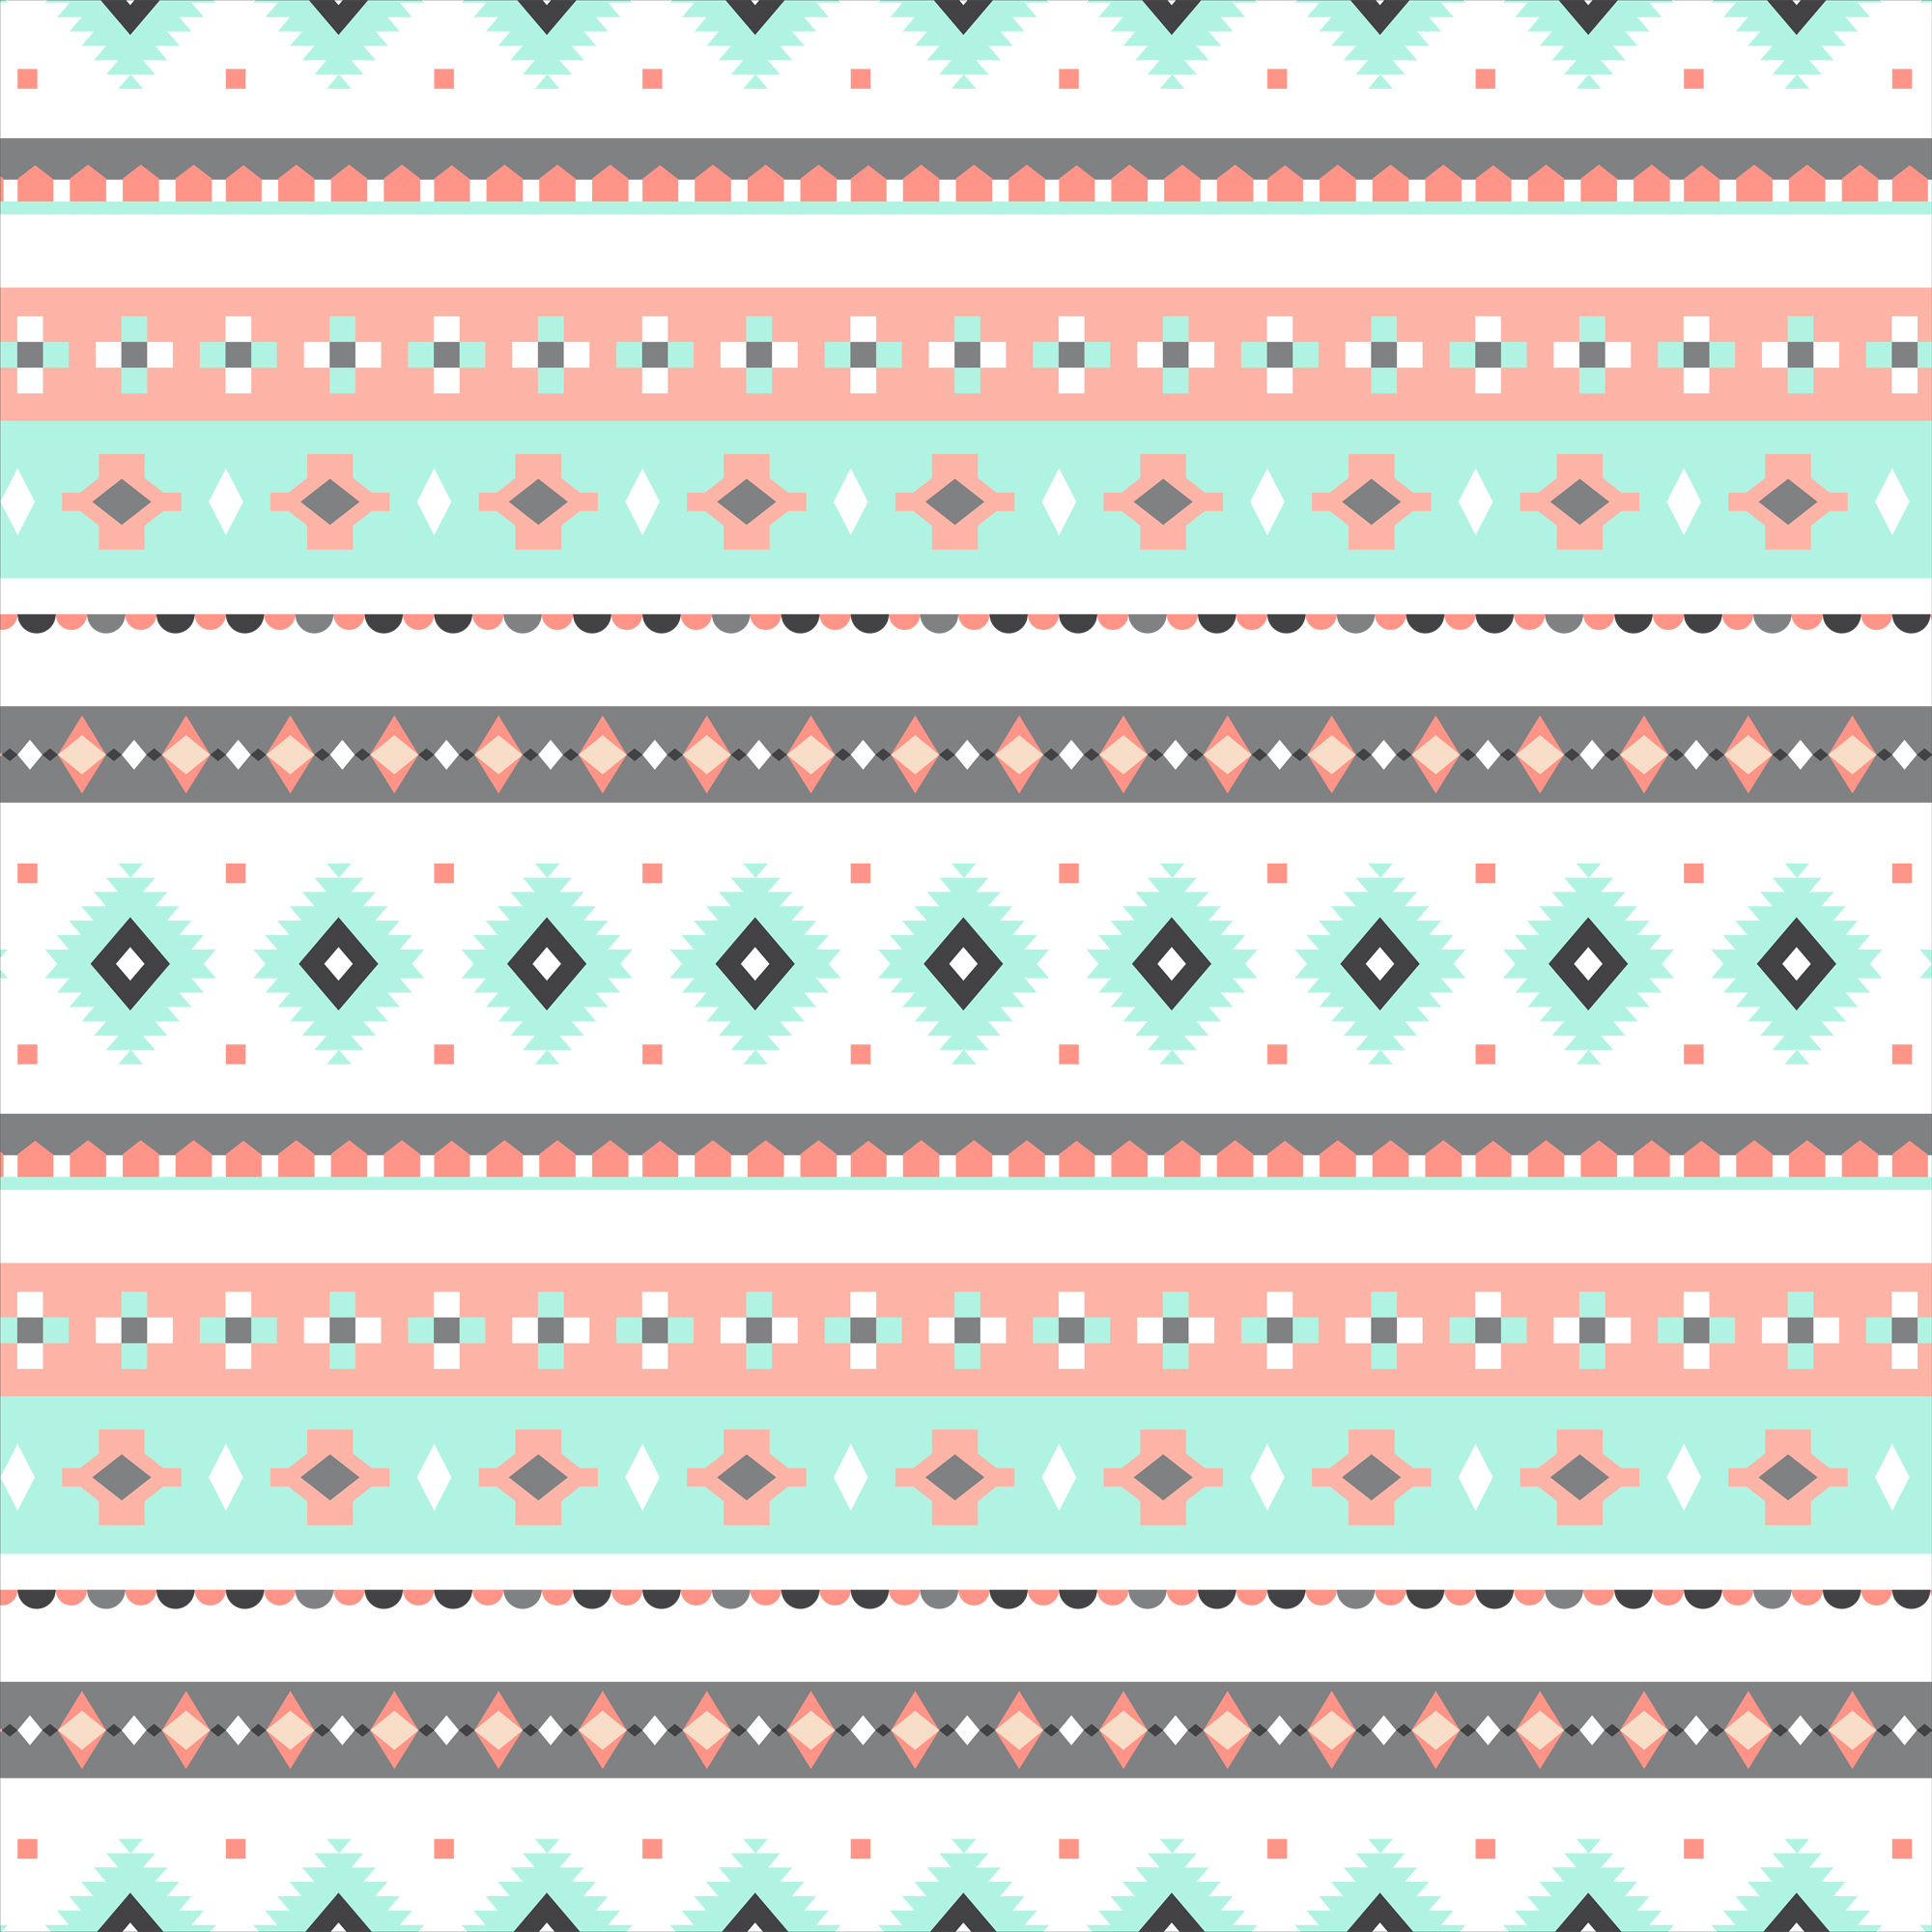 "David Textiles Fleece 36"" x 60"" Anti-Pill Bohemian Diamond Stripe Fabric, 1 Each"